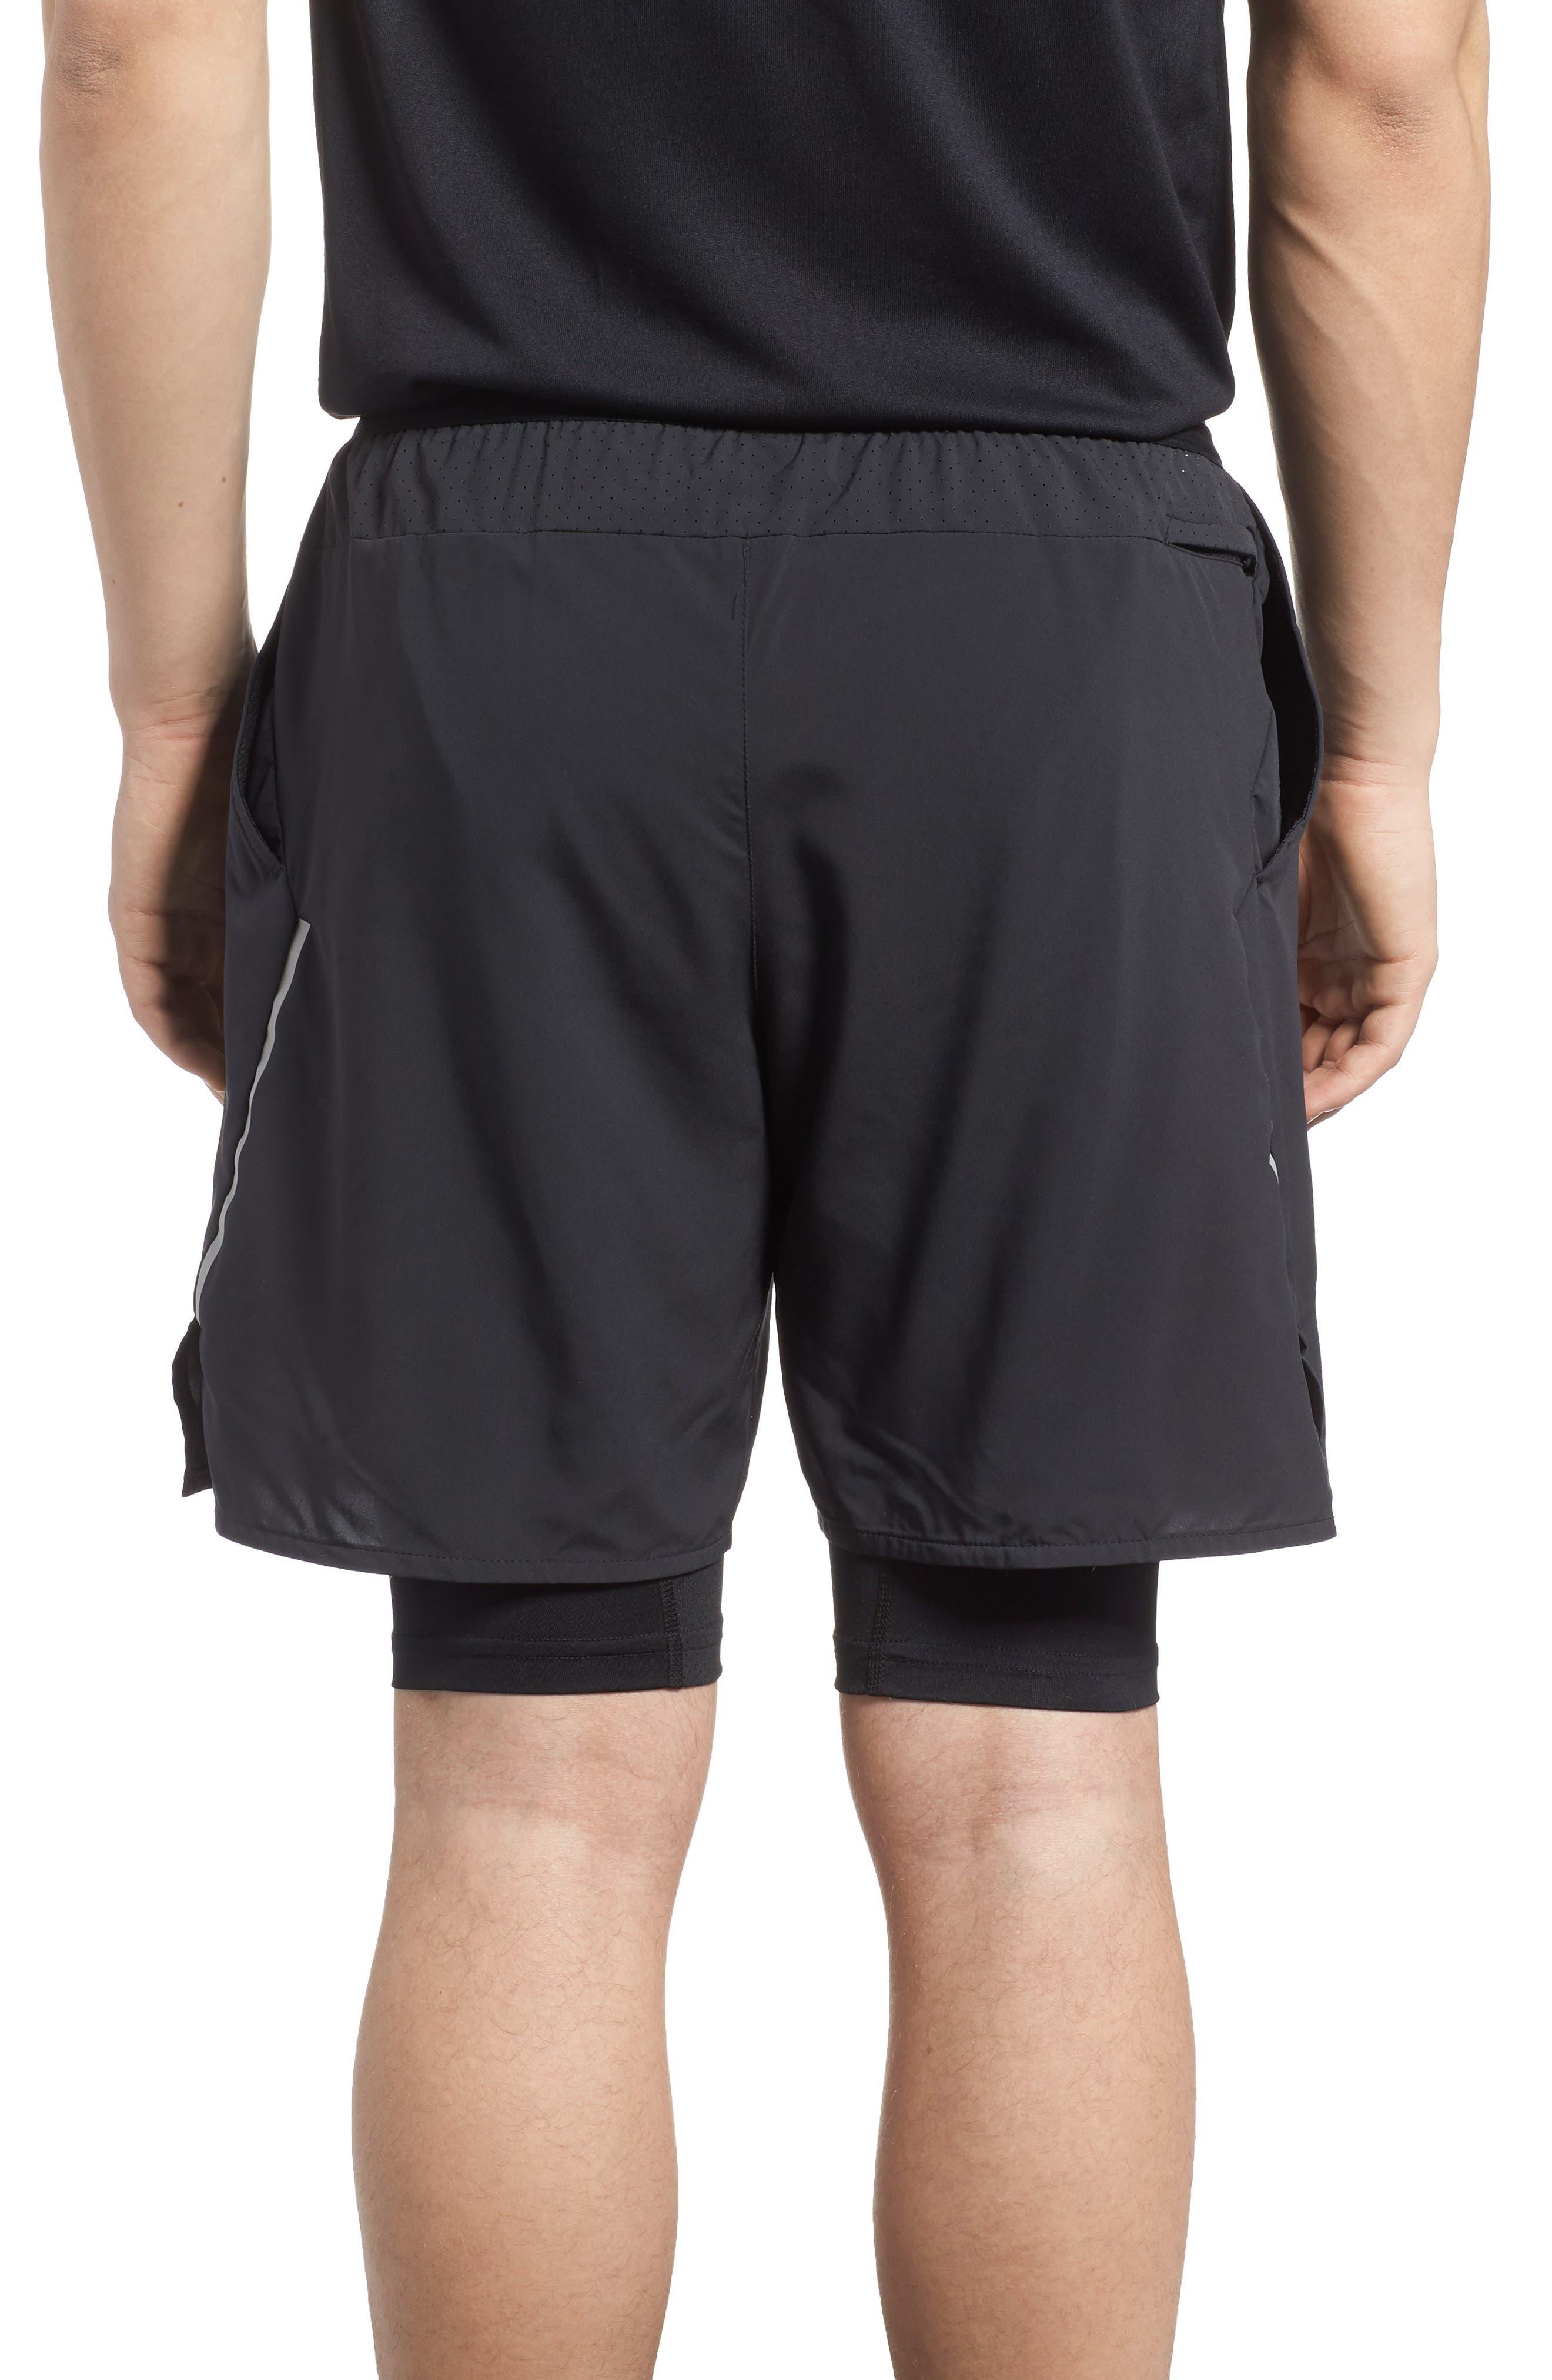 Flex Distance Running Shorts,                             Alternate thumbnail 2, color,                             Black/ Black